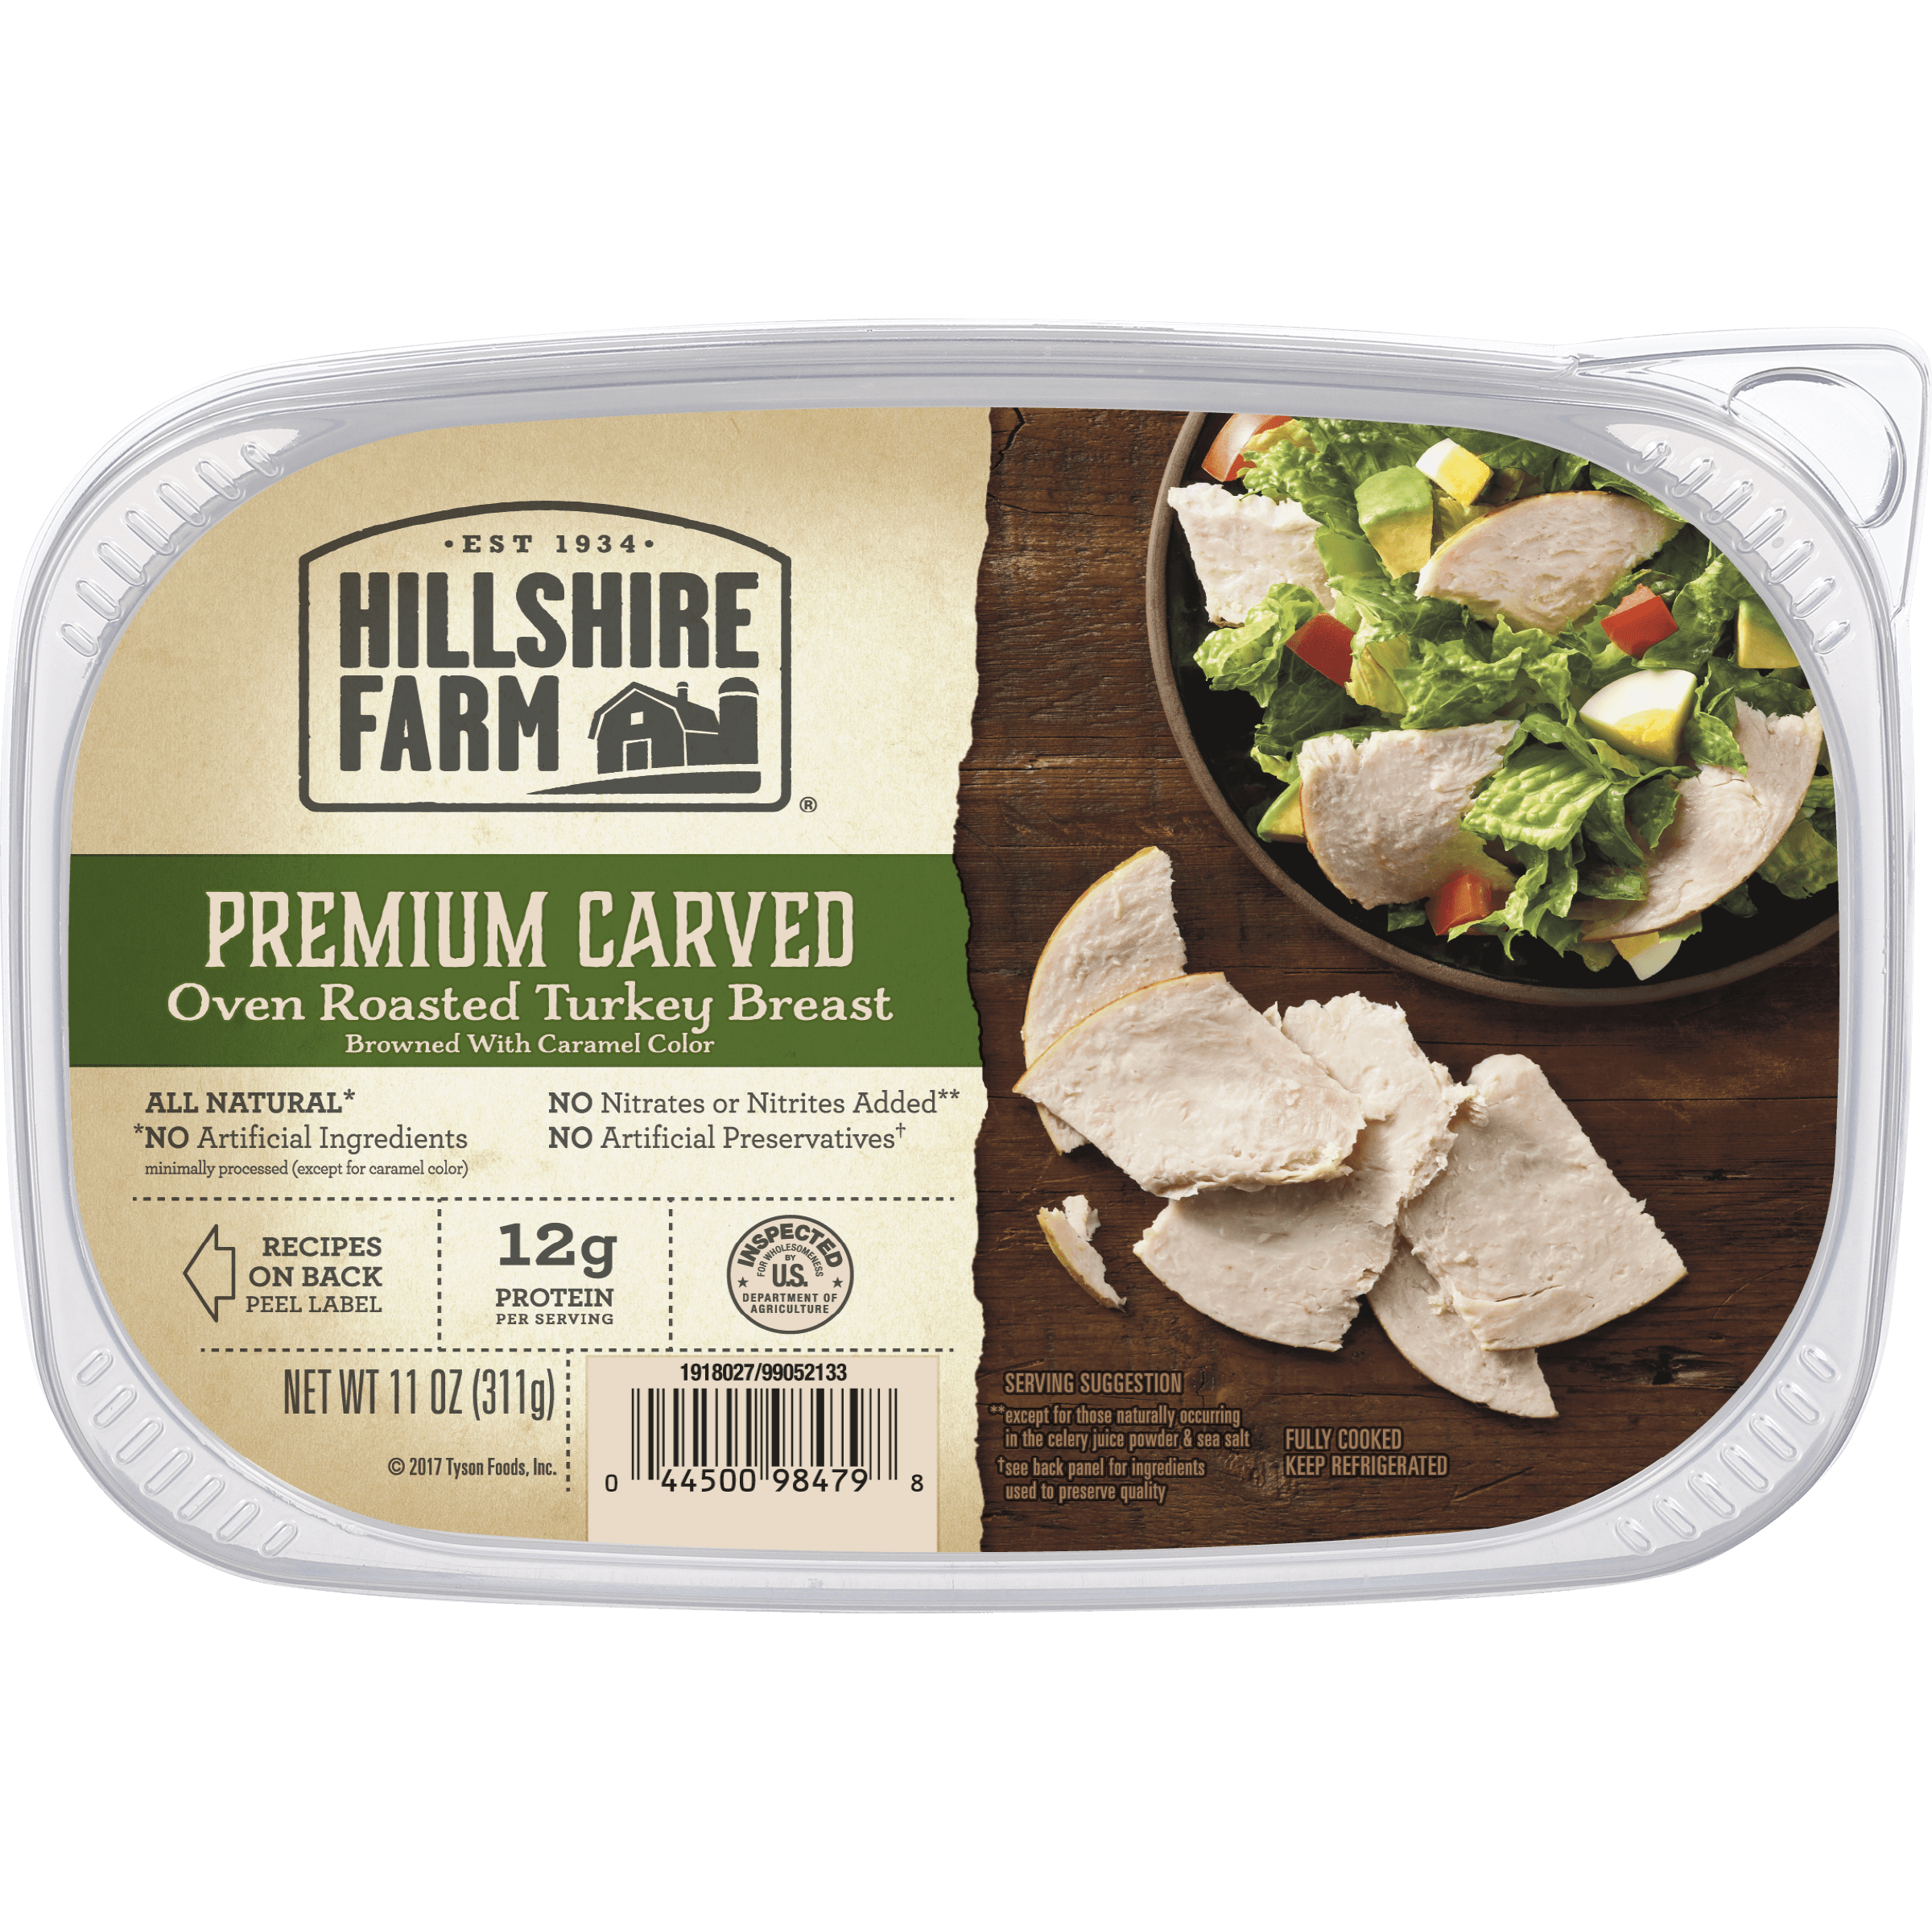 Hillshire Farm Premium Carved Oven Roasted Turkey Breast, 11 Oz.